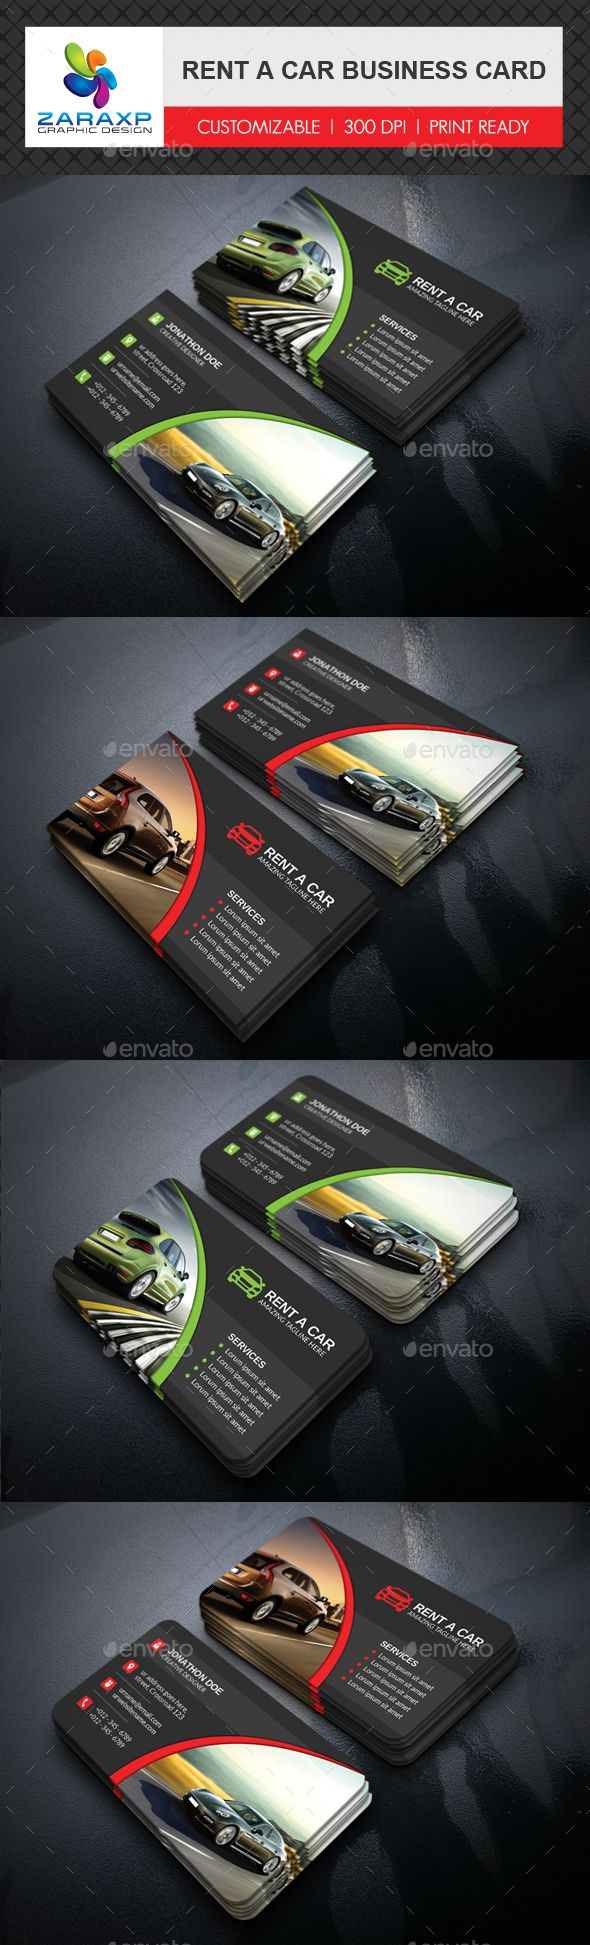 Rent A Car Business Card Template PSD #visitcard #design Download: http://graphicriver.net/item/rent-a-car-business-card/13495756?ref=ksioks